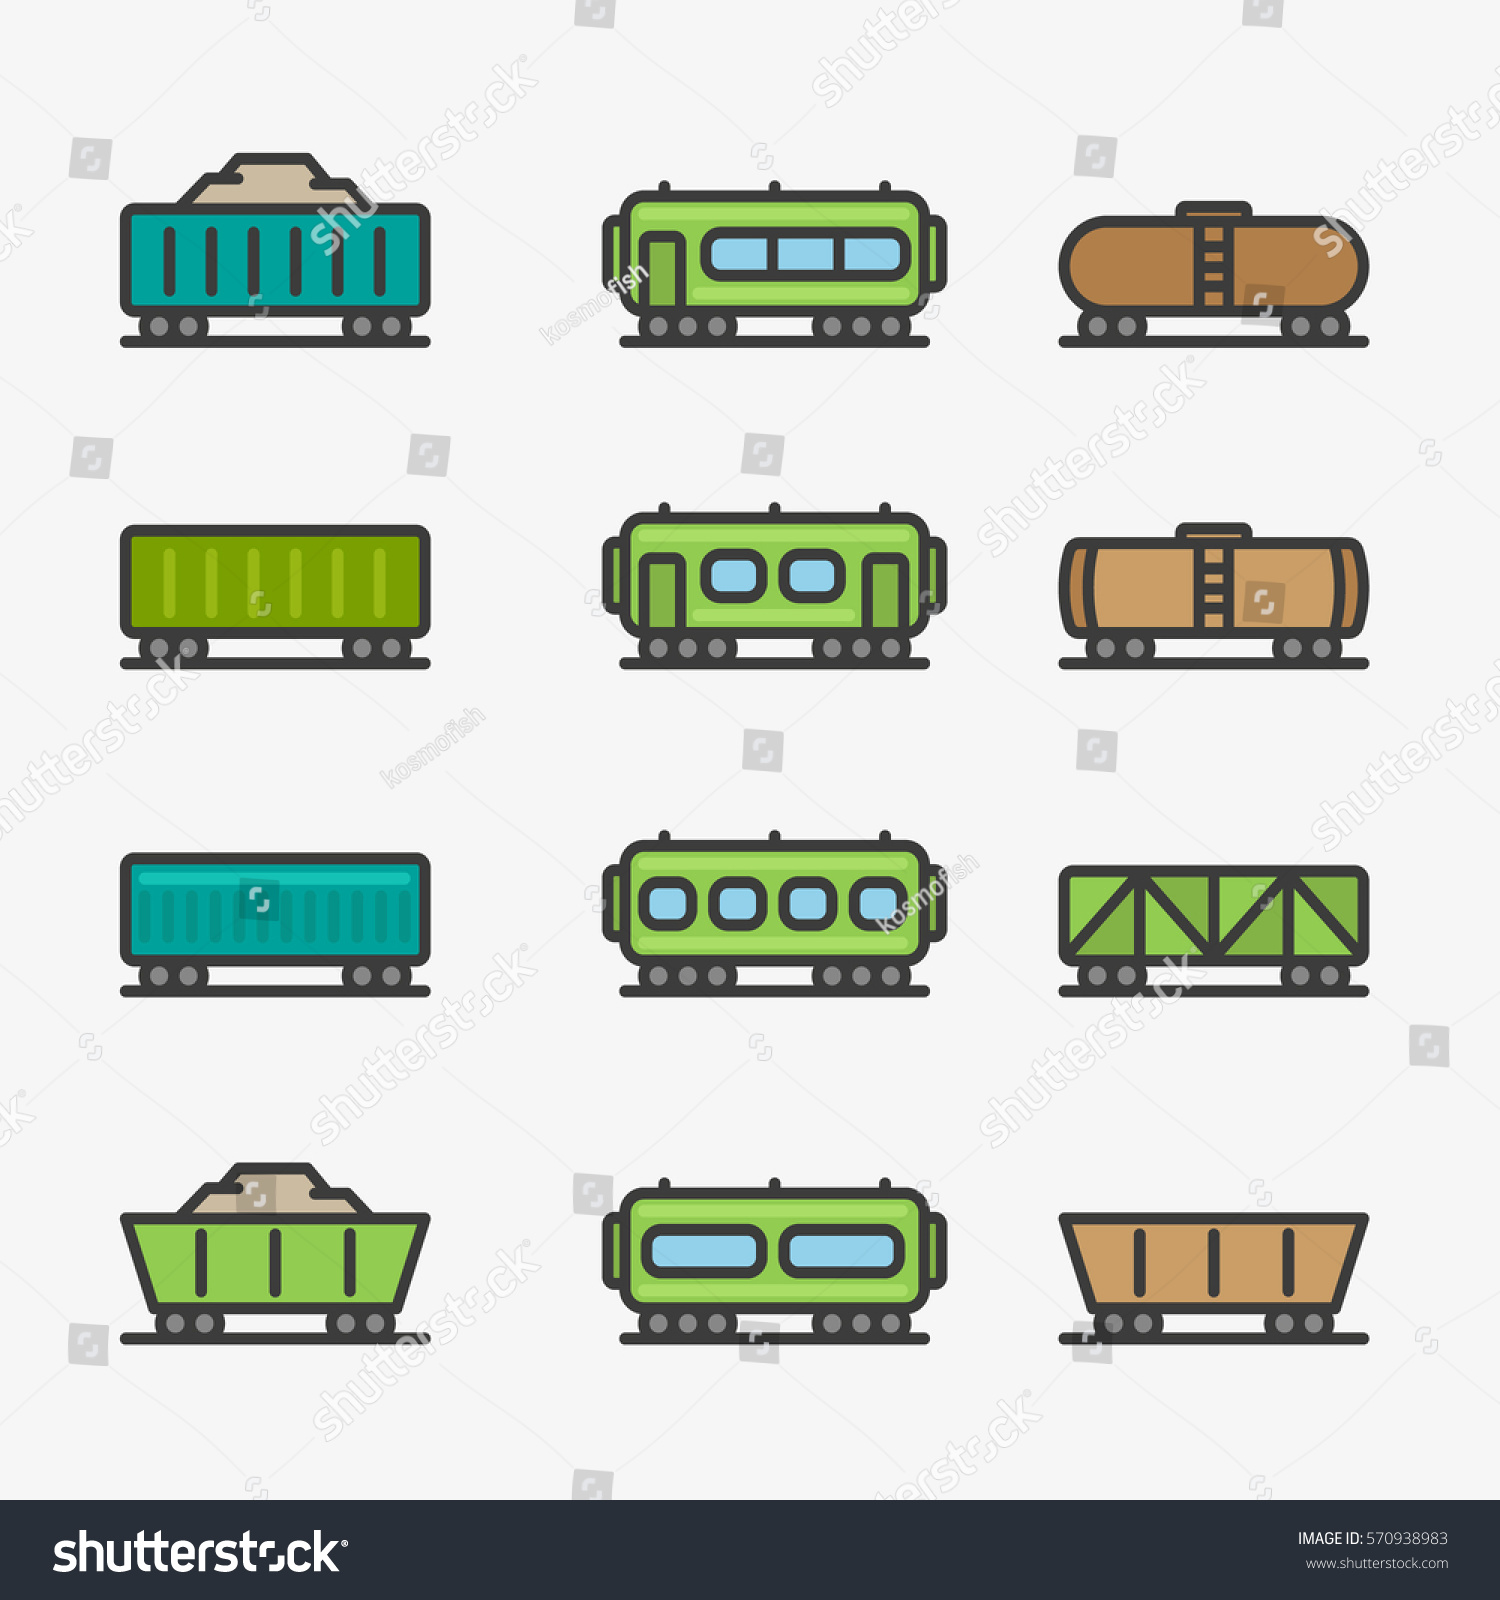 Cargo Wagon Train Container Minimal Color Stock Vector 570938983 ...